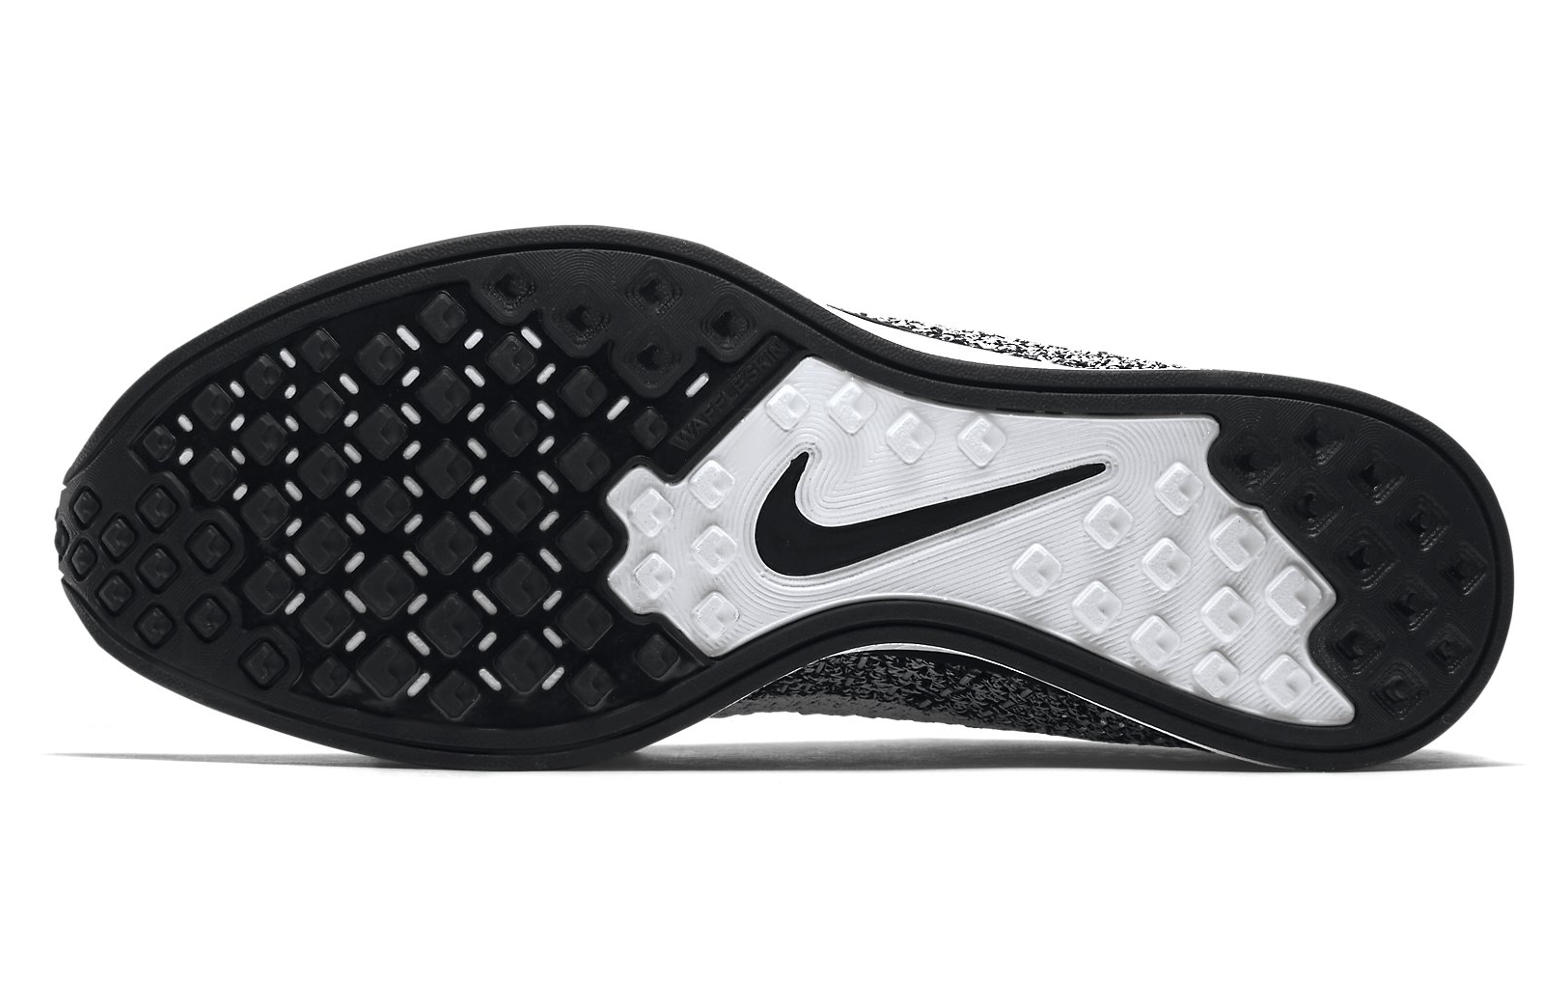 a8b8ffad NIKE Shoes FLYKNIT RACER OREO Black White | Alltricks.com